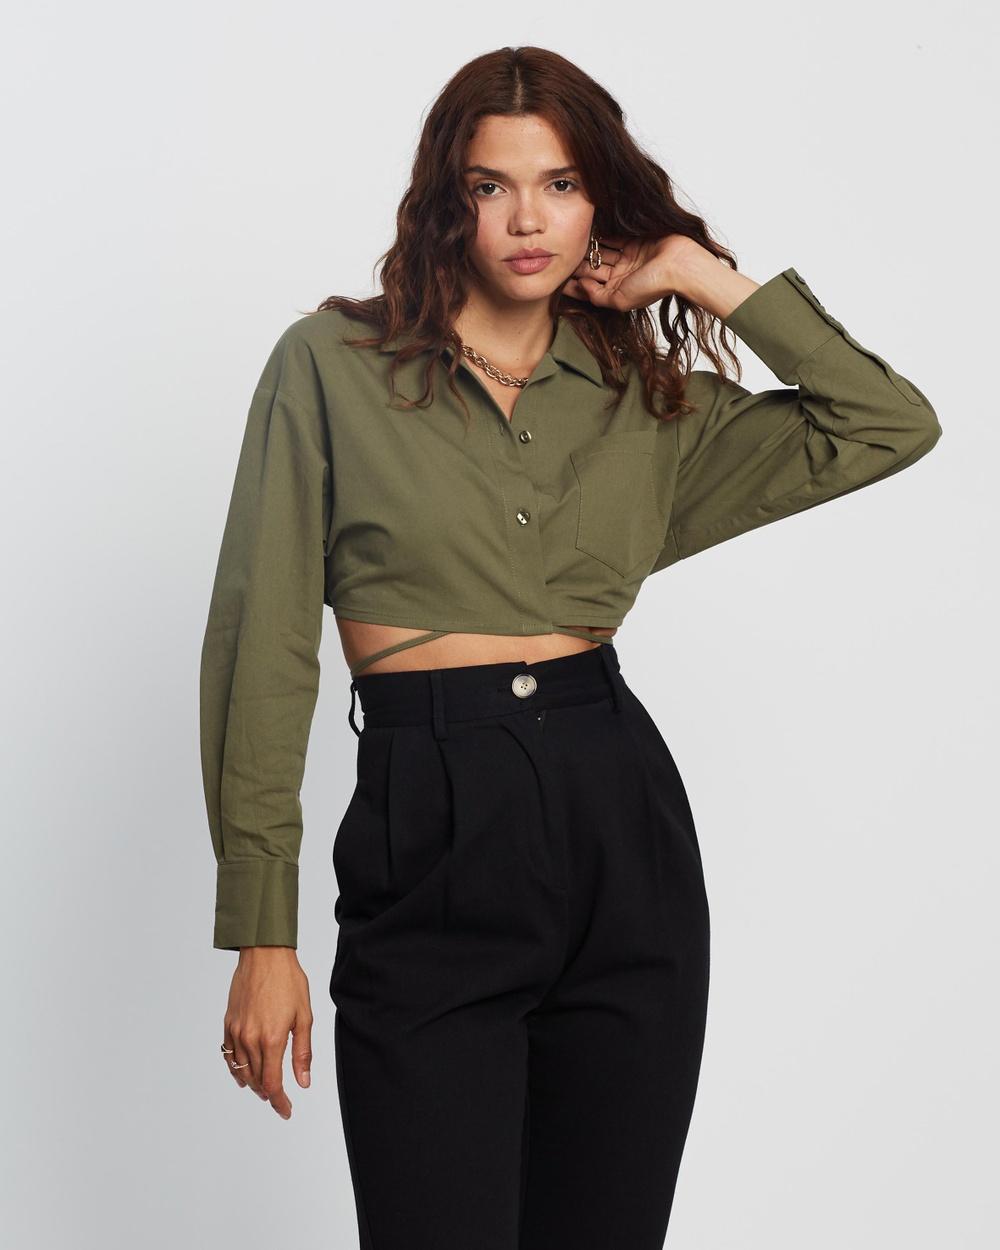 AERE Organic Cotton Cross Front Shirt Cropped tops Khaki